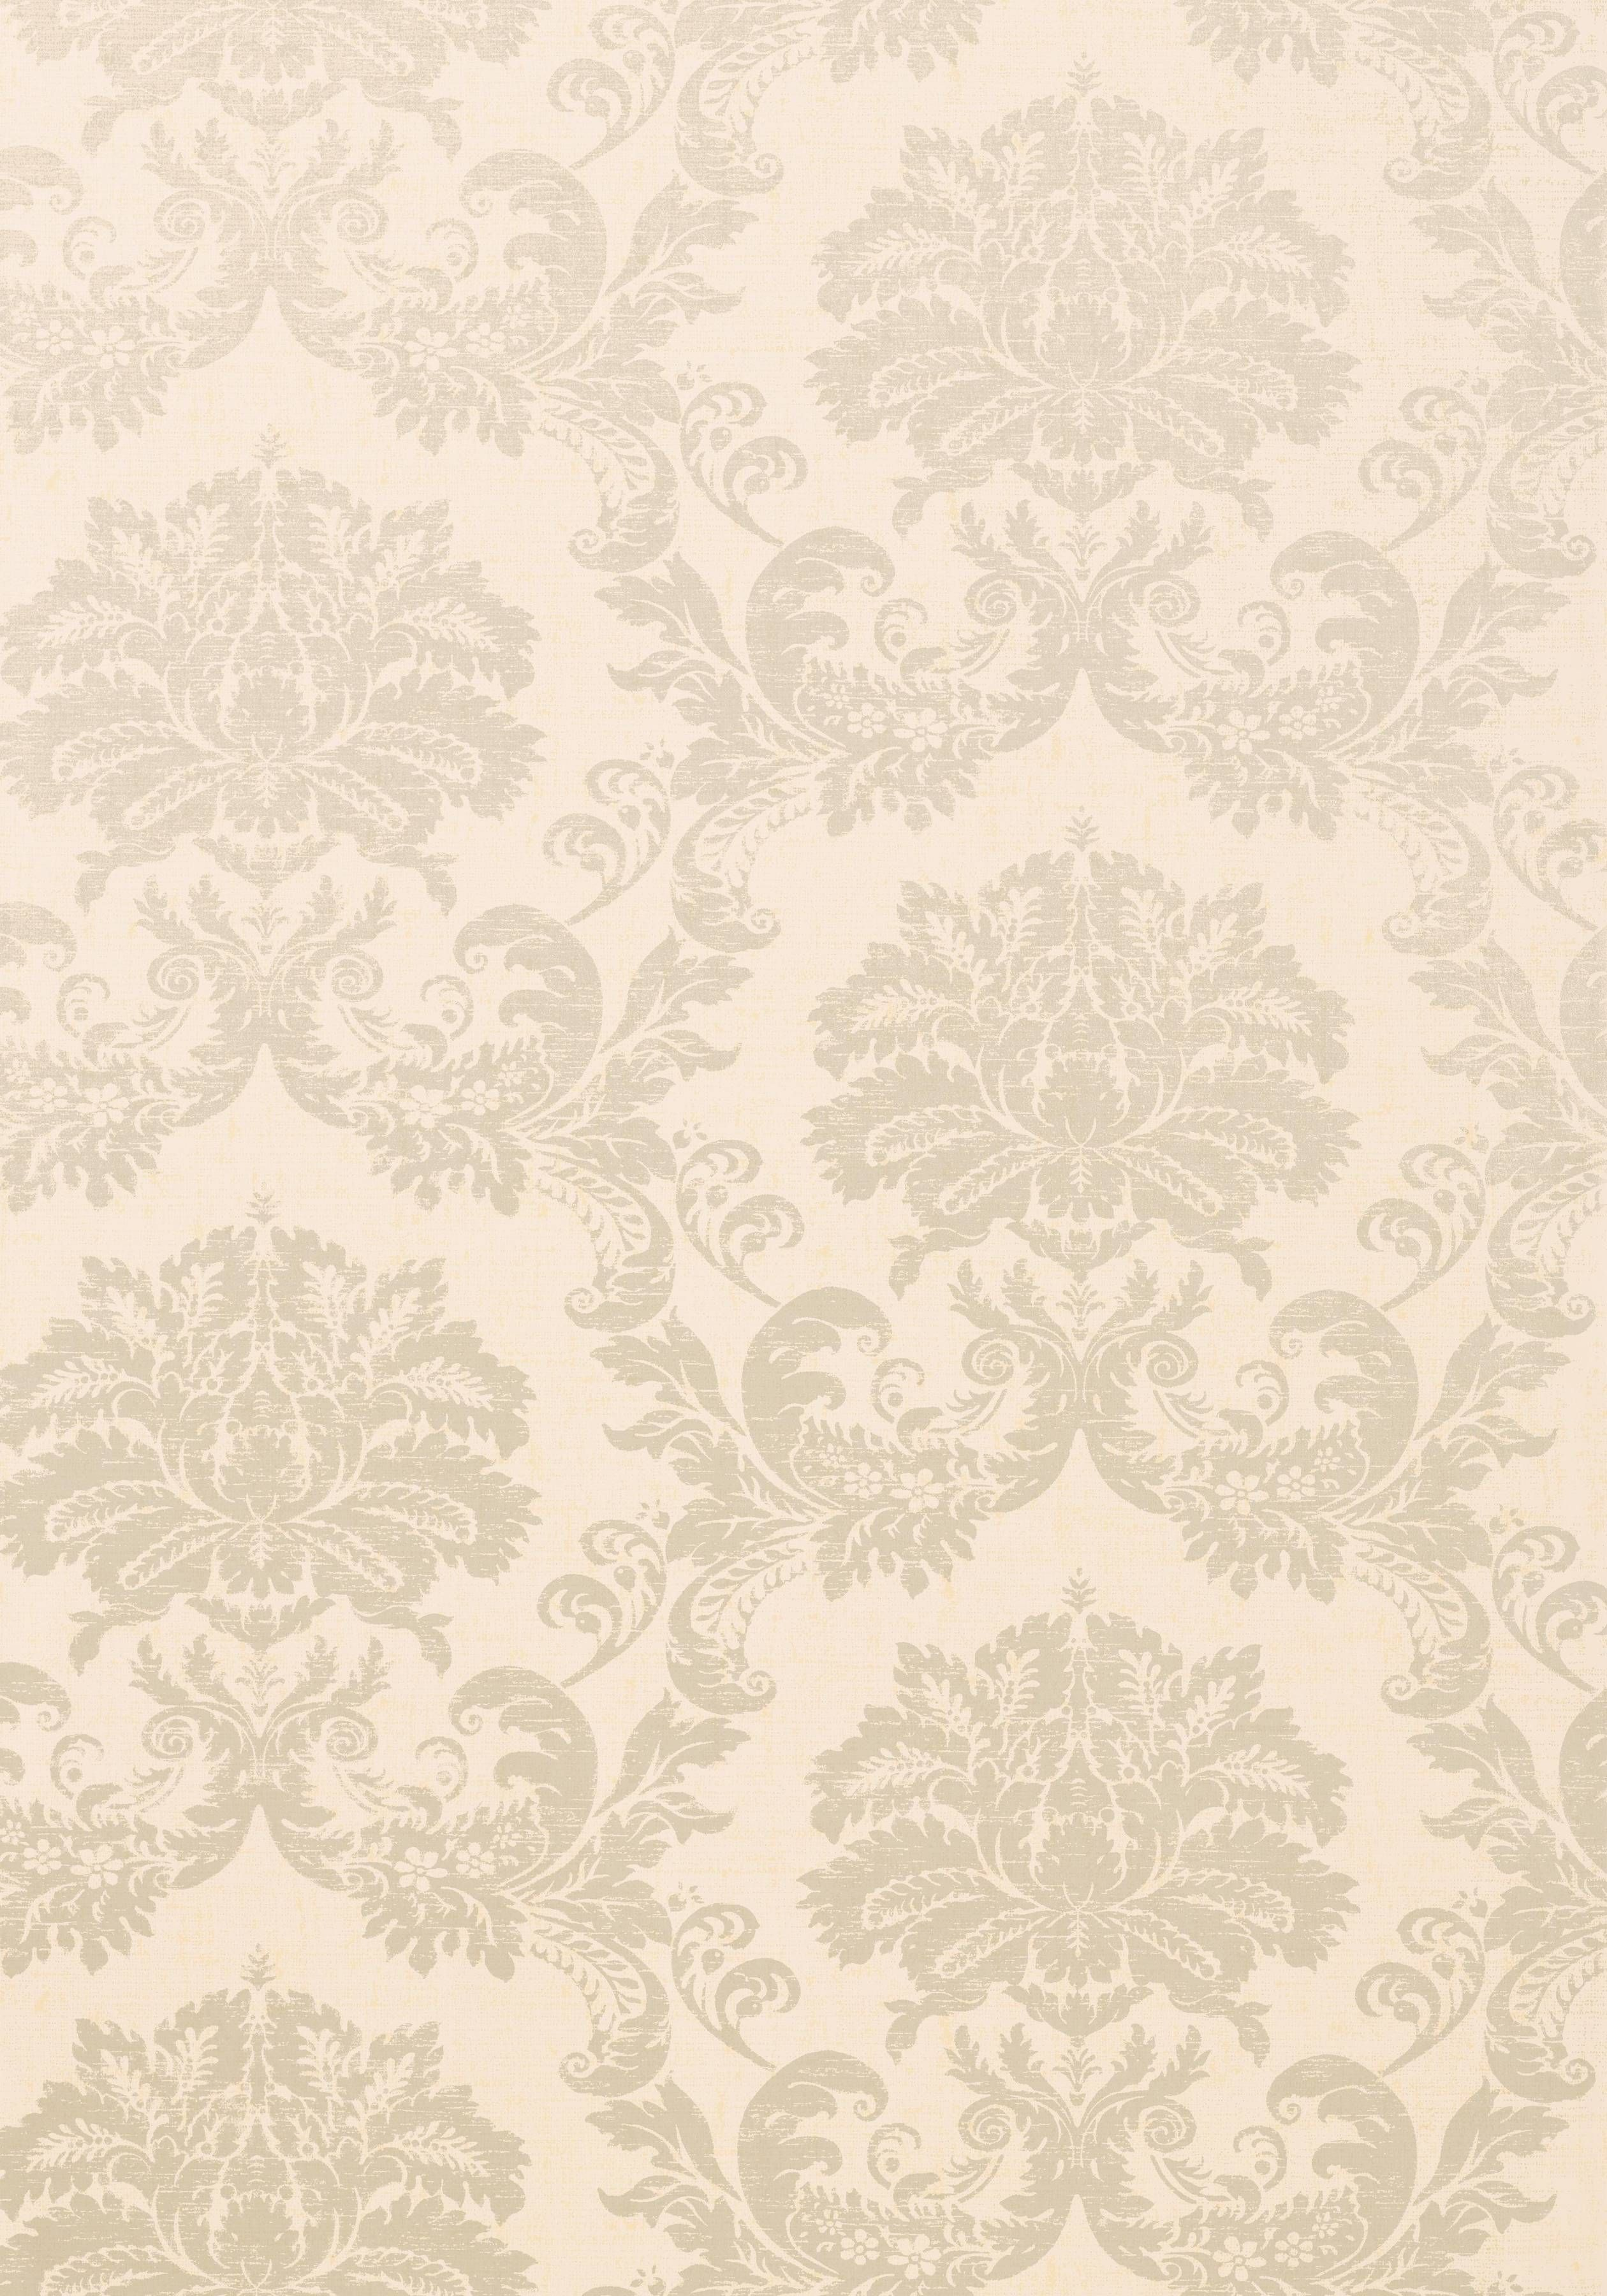 SYMPHONY DAMASK, Metallic Pearl on White, T7634